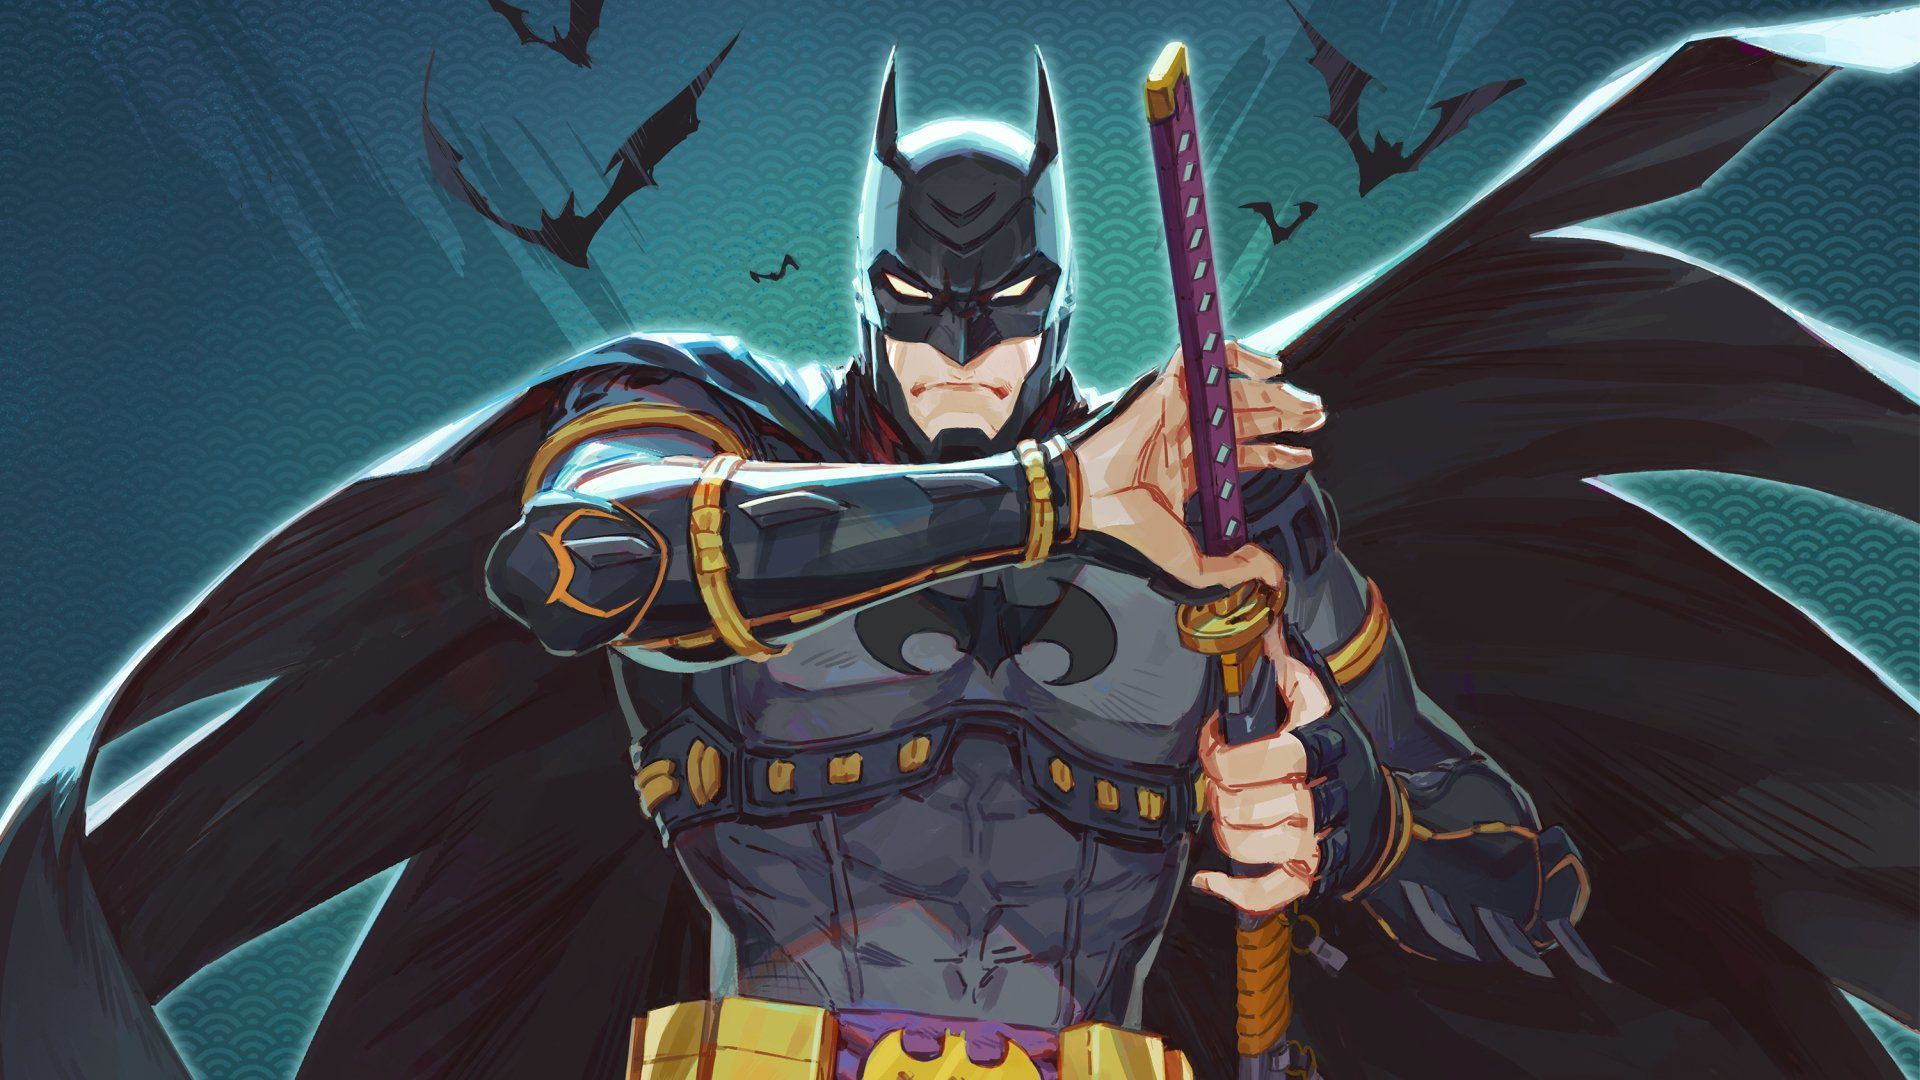 Batman Ninja Wallpapers Top Free Batman Ninja Backgrounds Wallpaperaccess